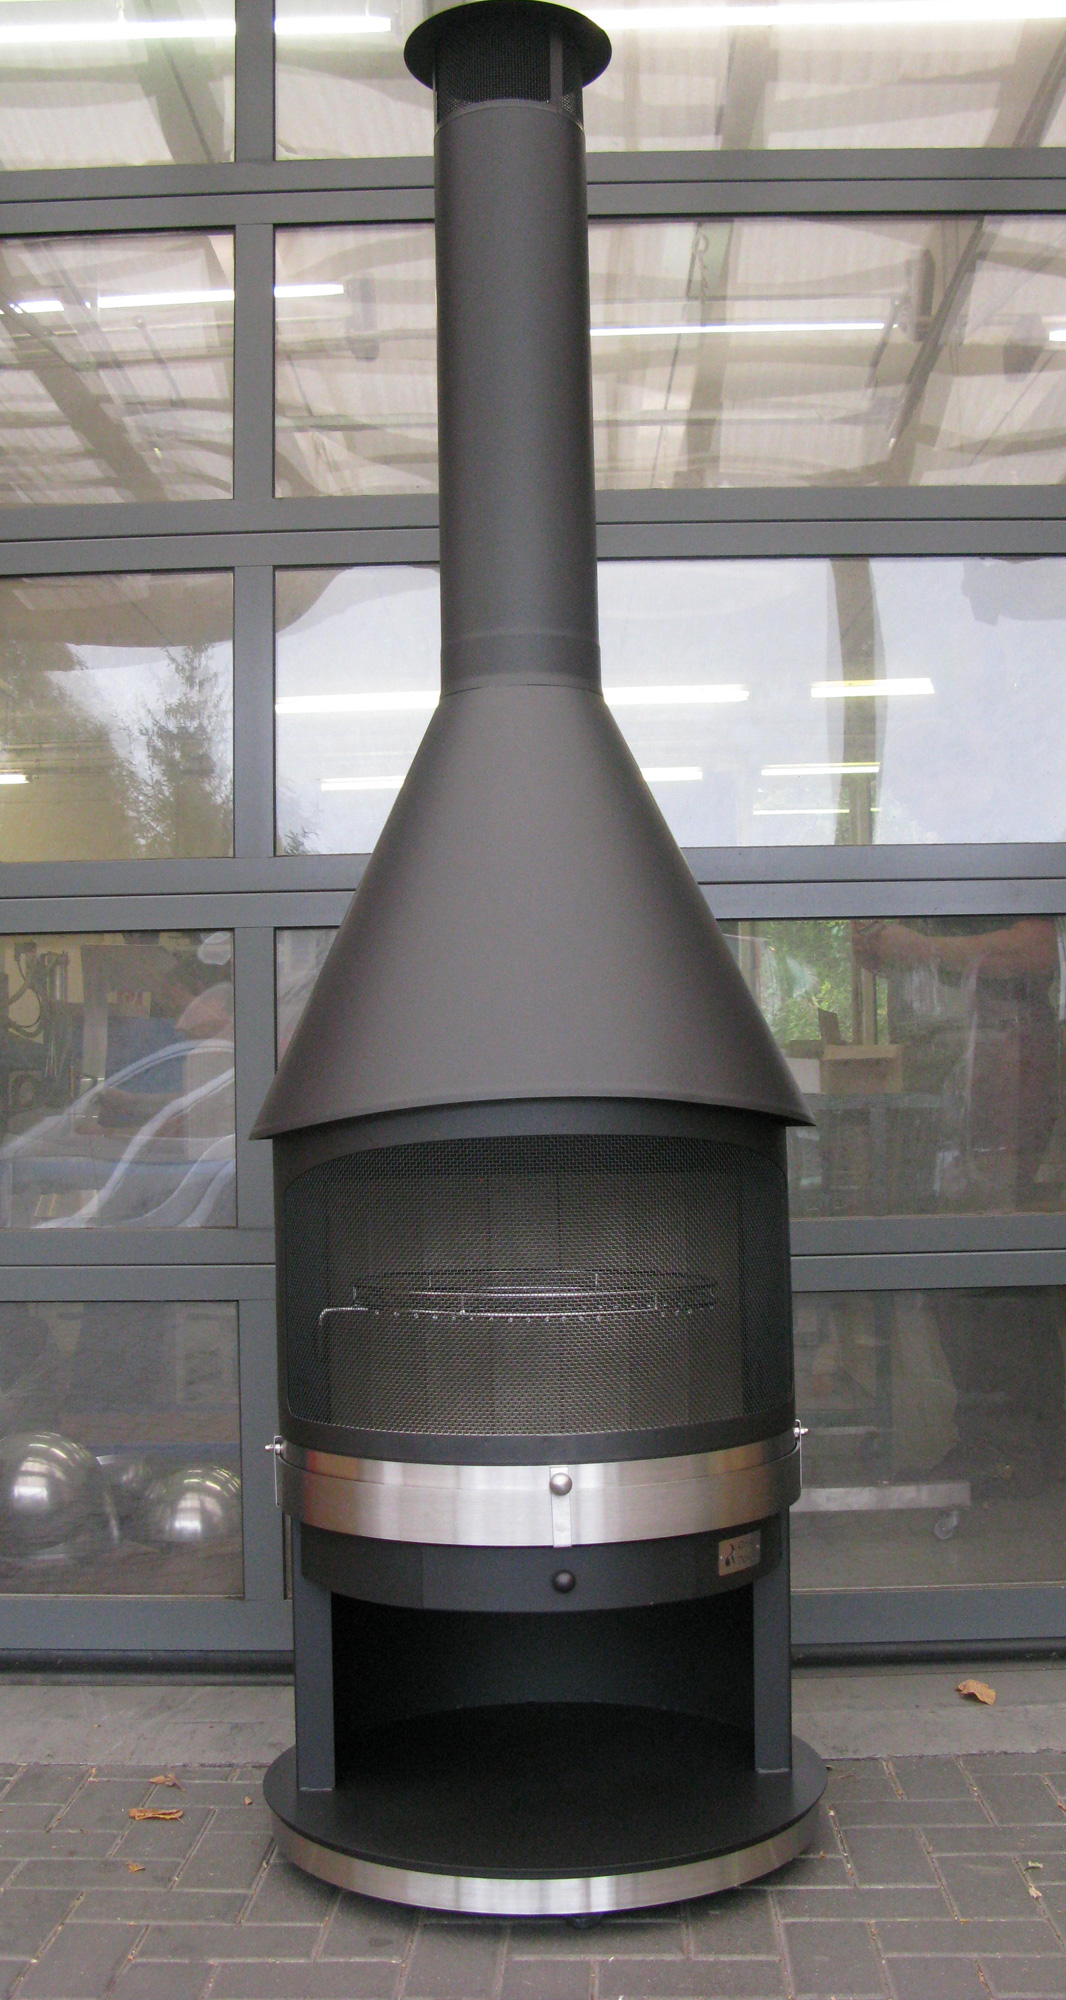 girse design grillkamin tirol typ 2 gartenkamin grau. Black Bedroom Furniture Sets. Home Design Ideas